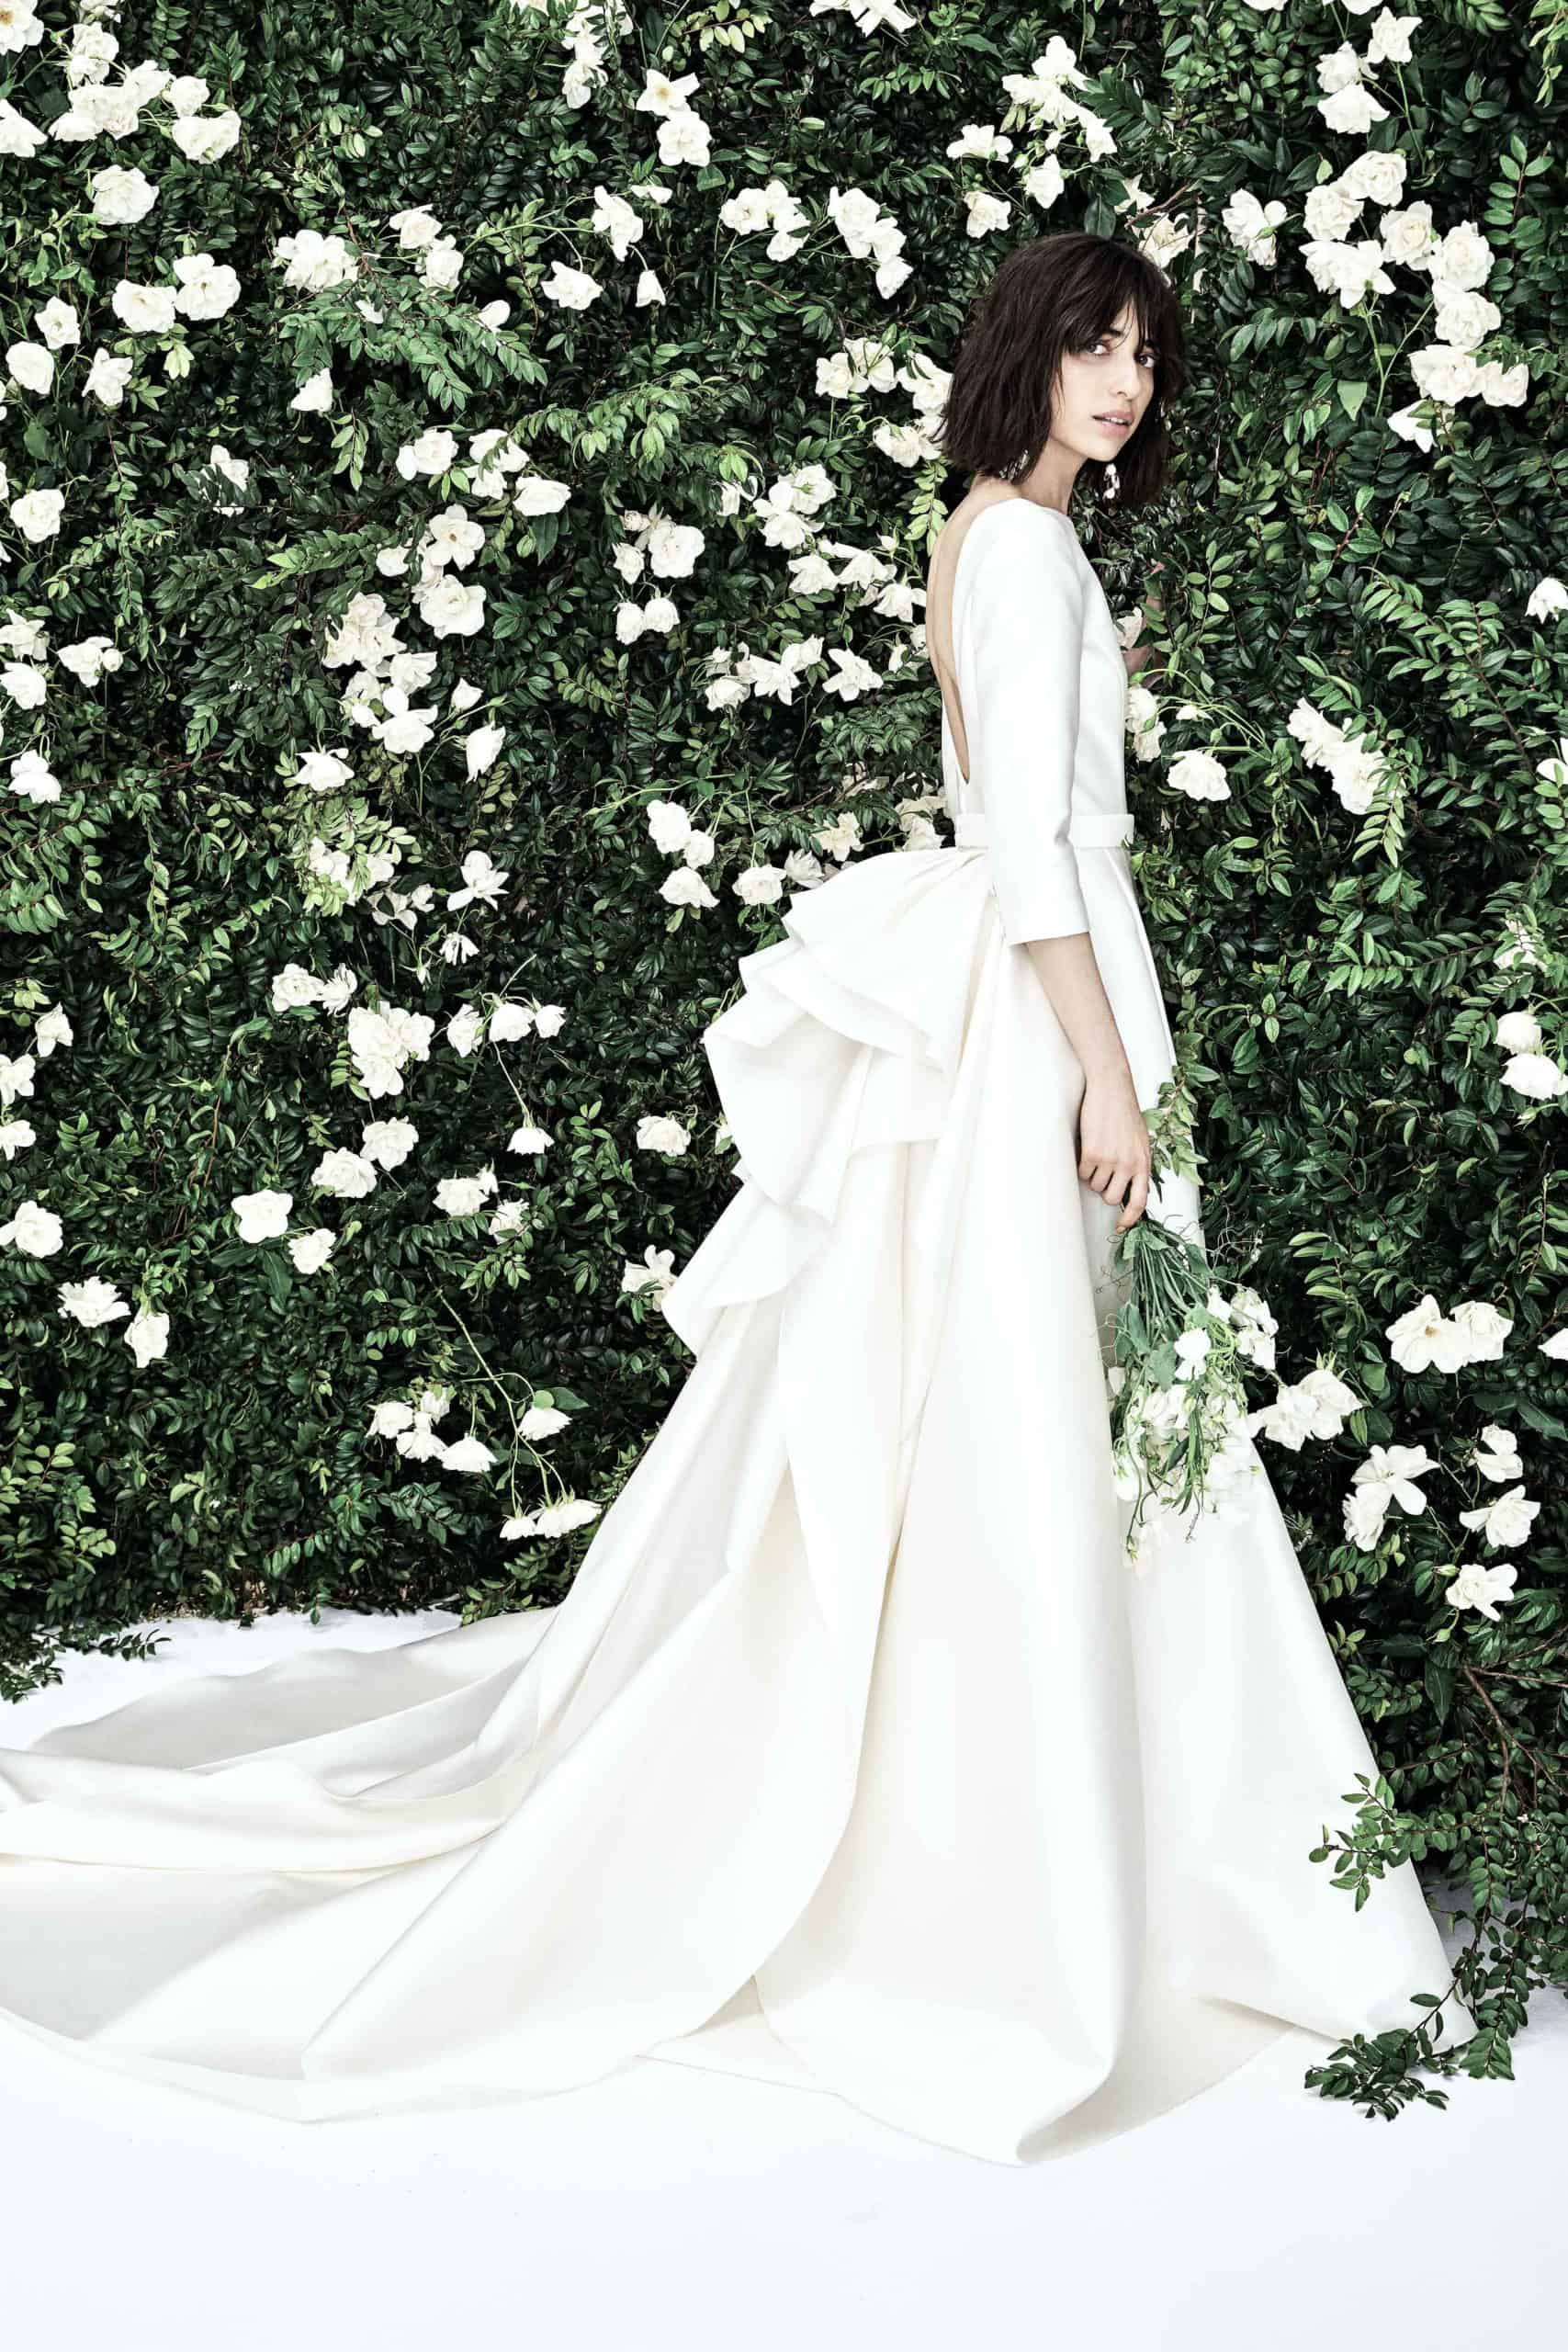 wedding dress with back bow and tail by Carolina Herrera